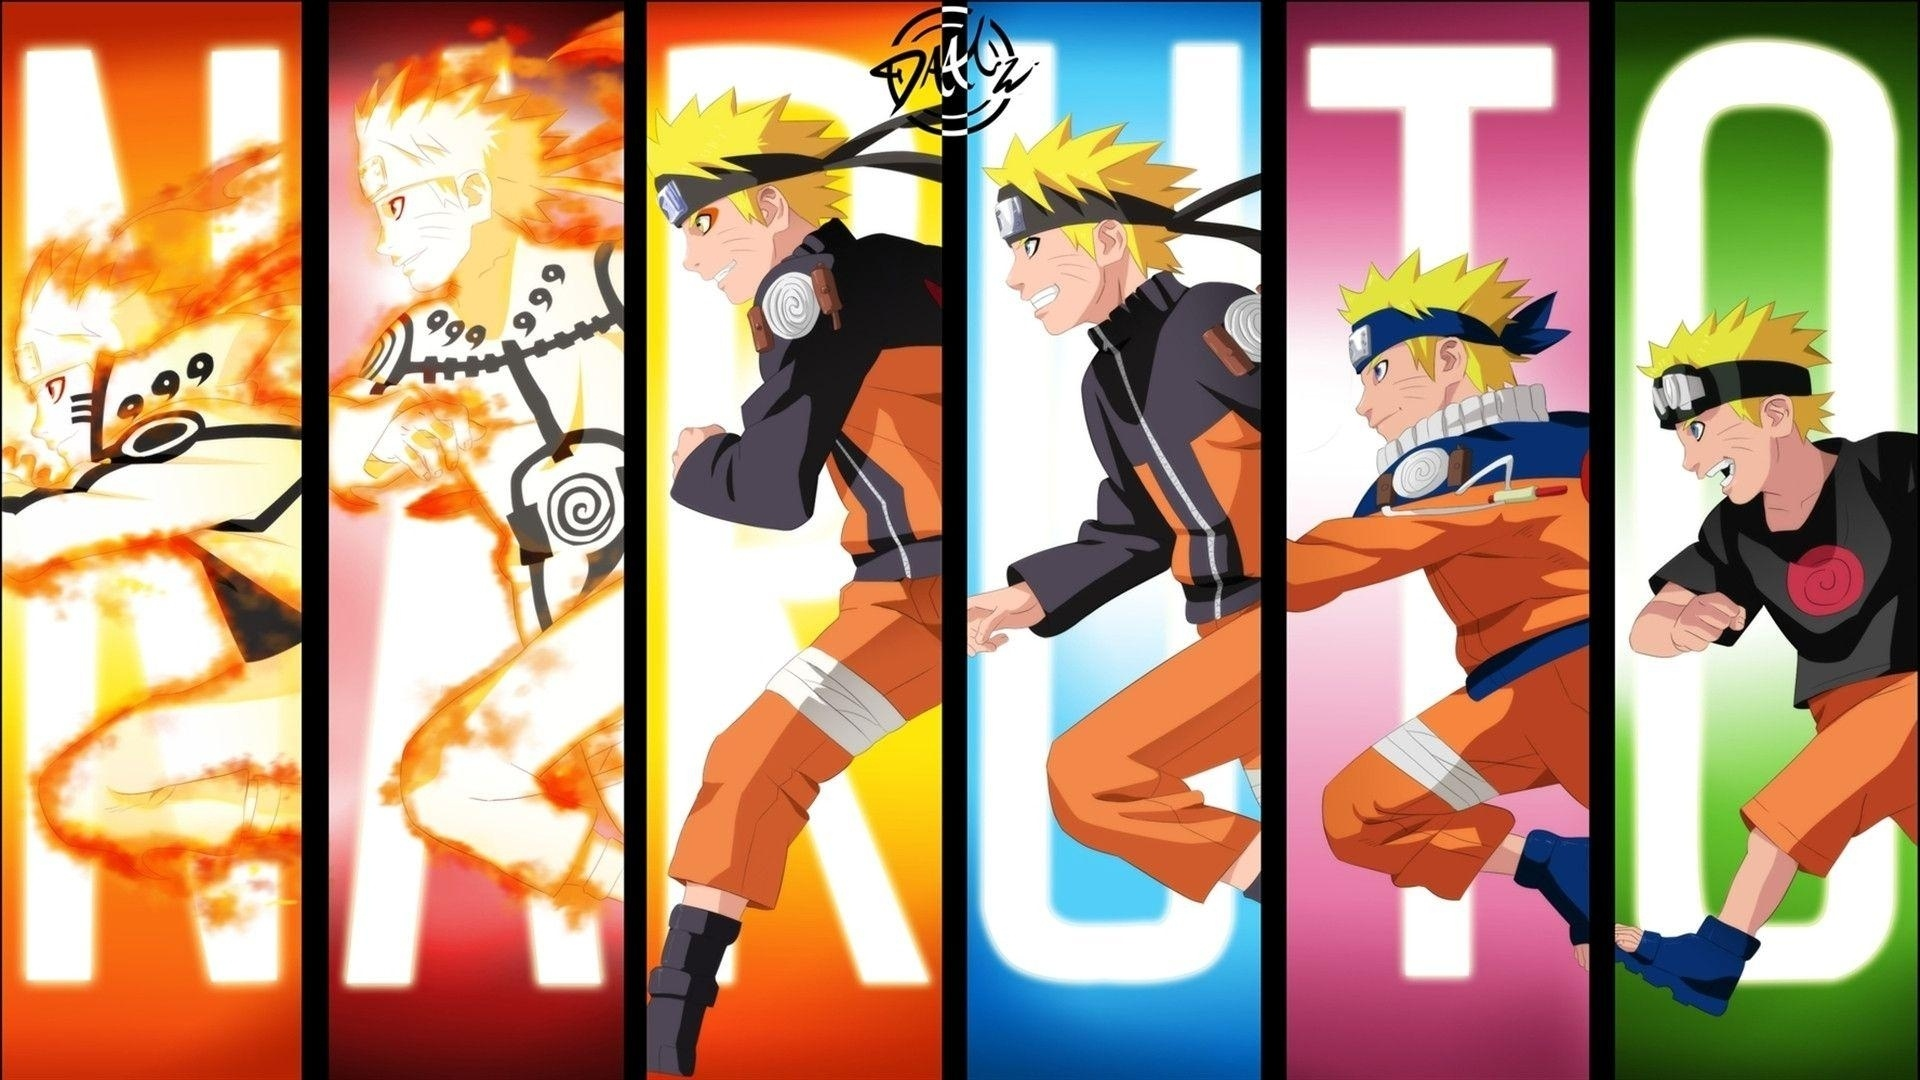 Naruto Uzumaki Wallpapers Wallpaper Cave desktop background